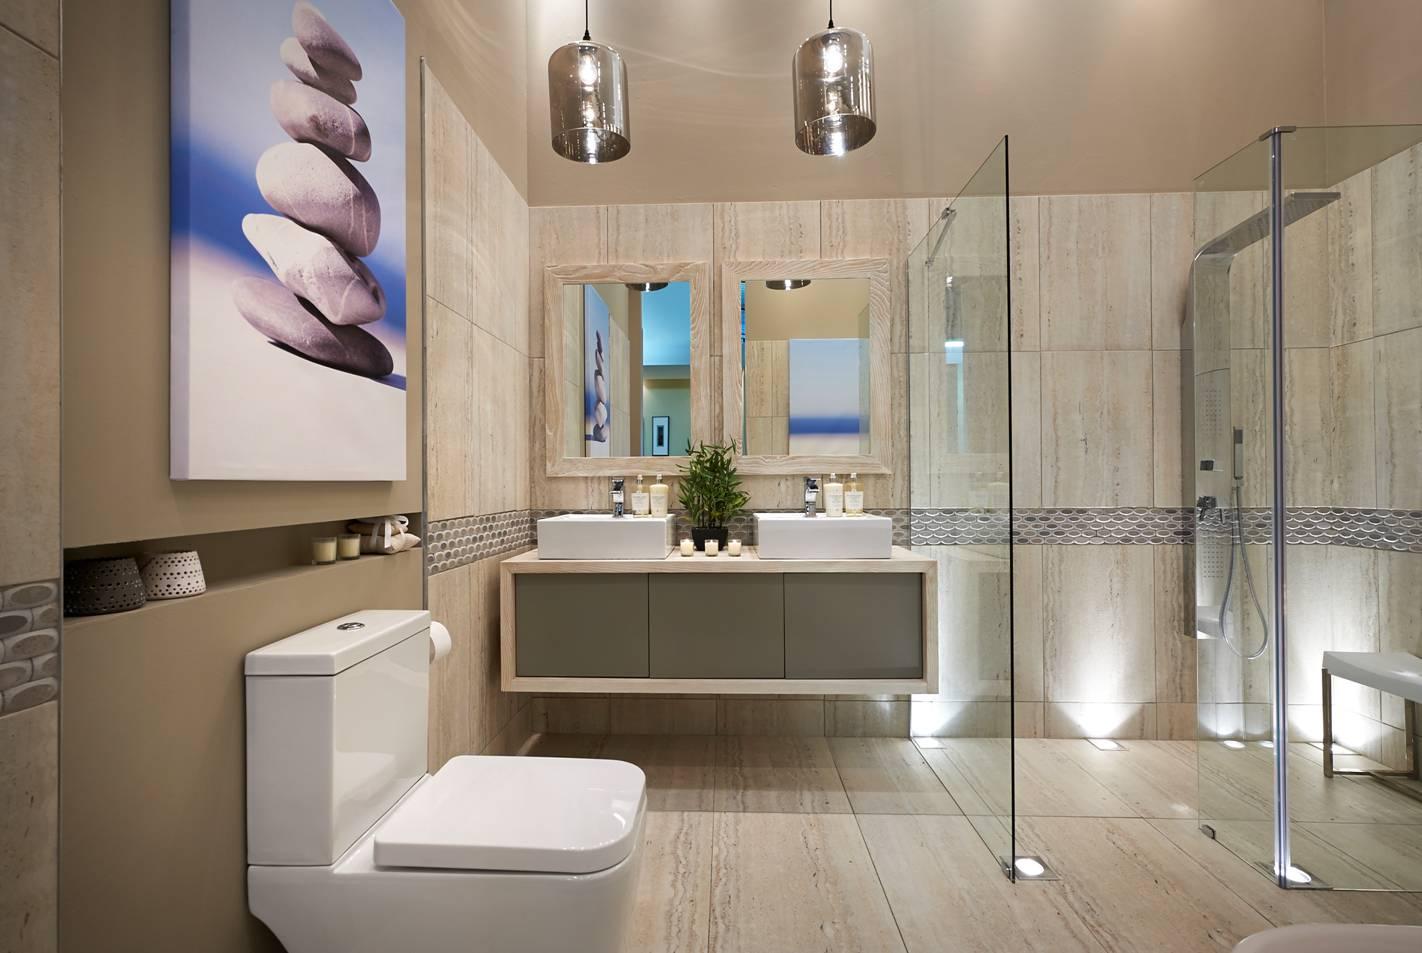 صور كتالوج حمامات 2017 بديكورات واطقم جديدة مودرن سوبر كايرو